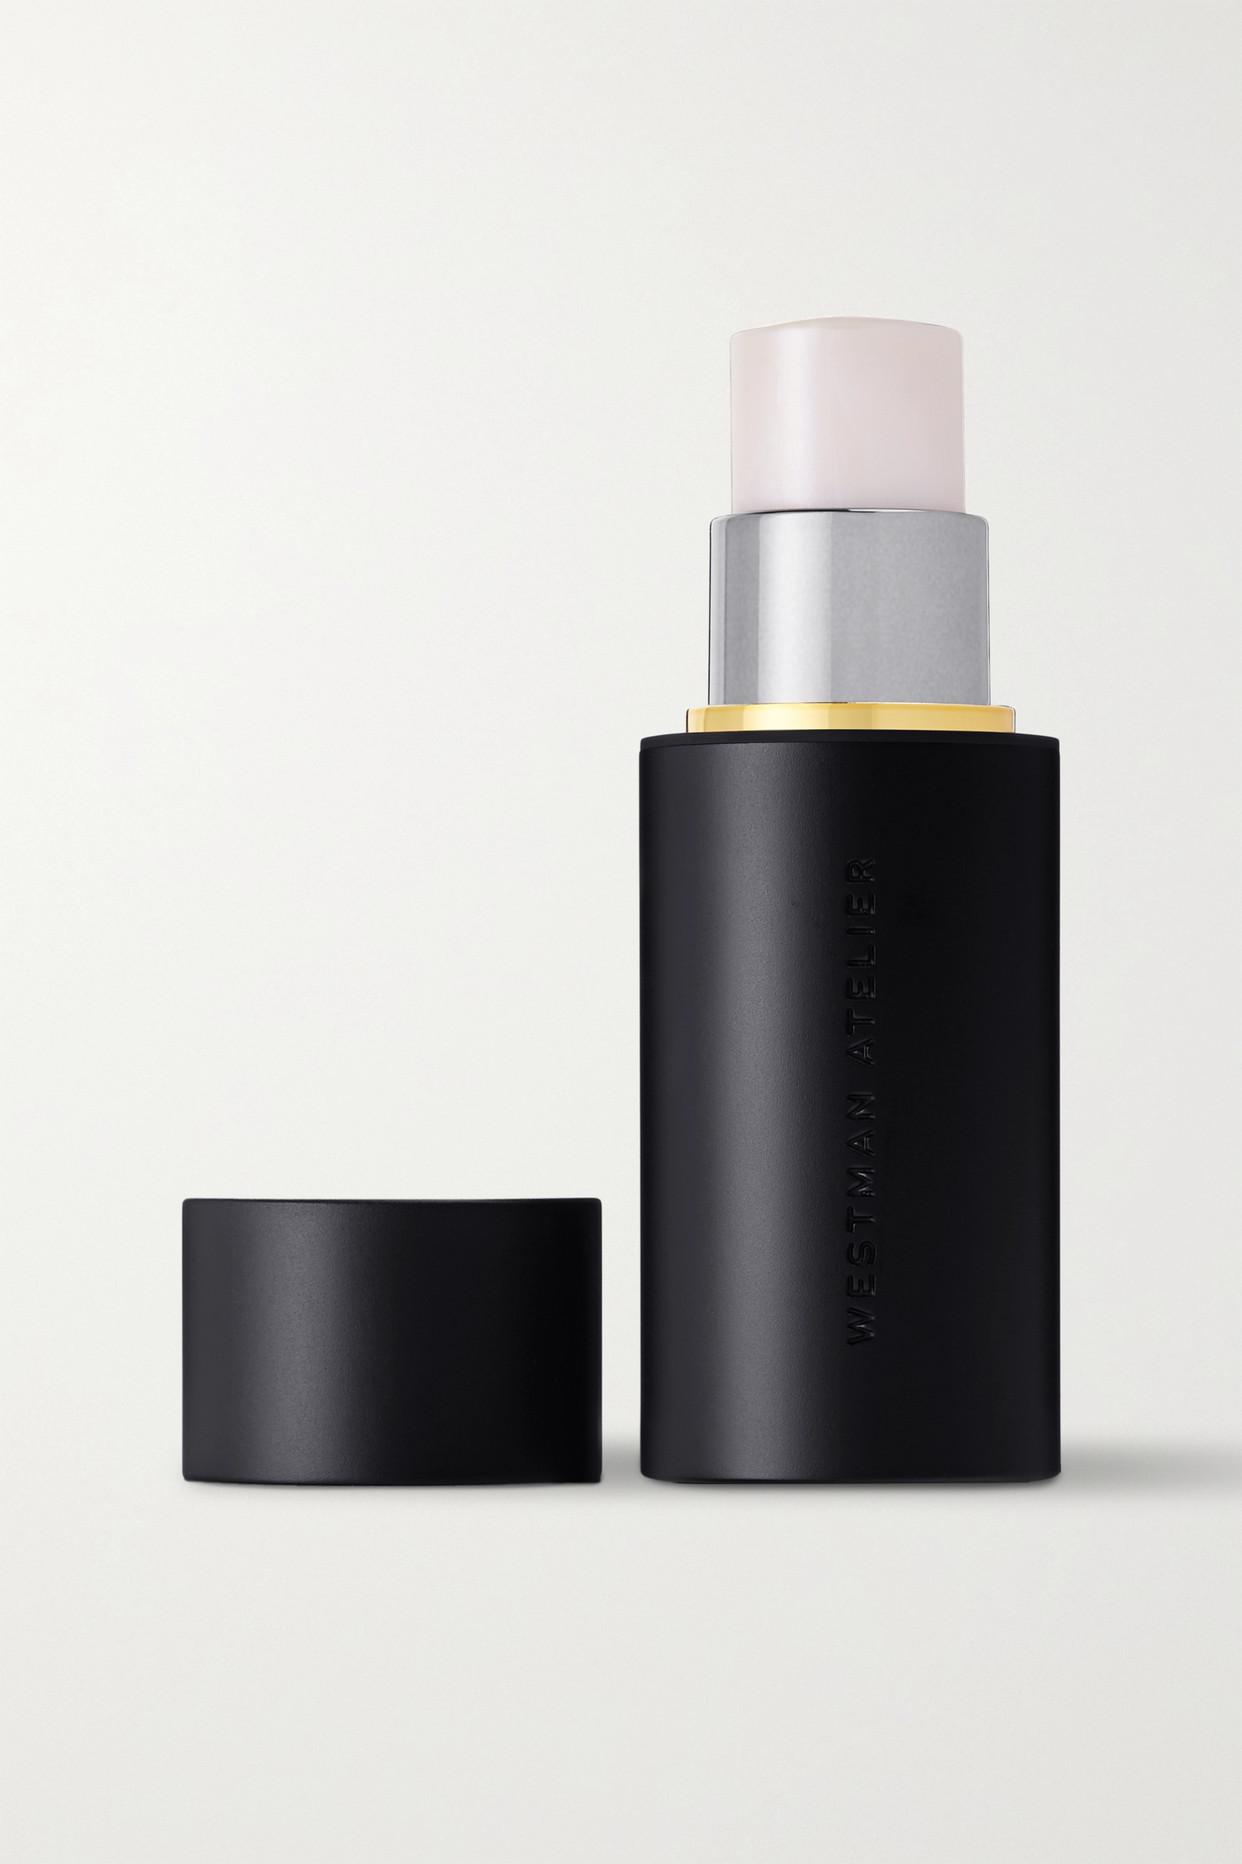 WESTMAN ATELIER - Lit Up Highlight Stick - Nectar - Neutrals - one size